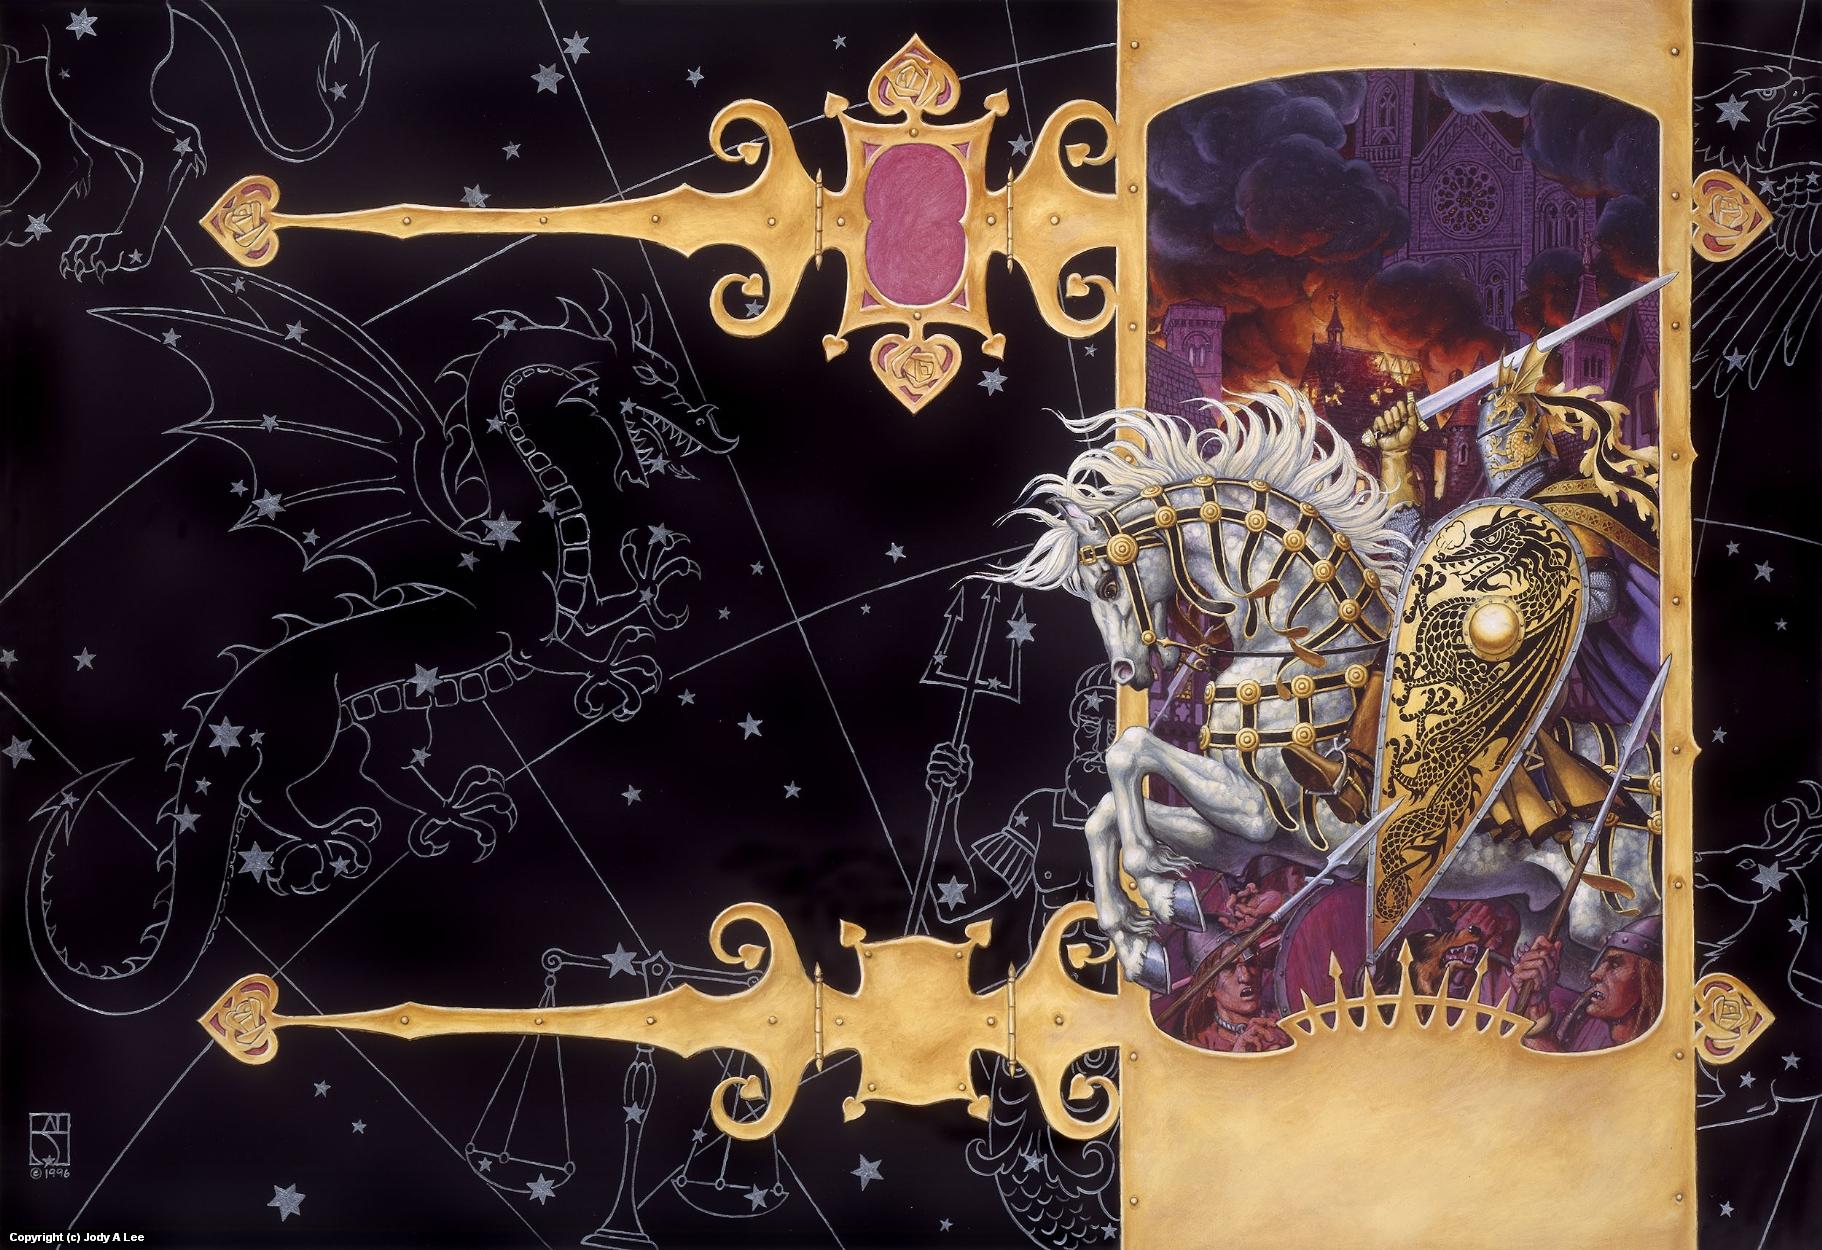 King's Dragon Artwork by Jody Lee